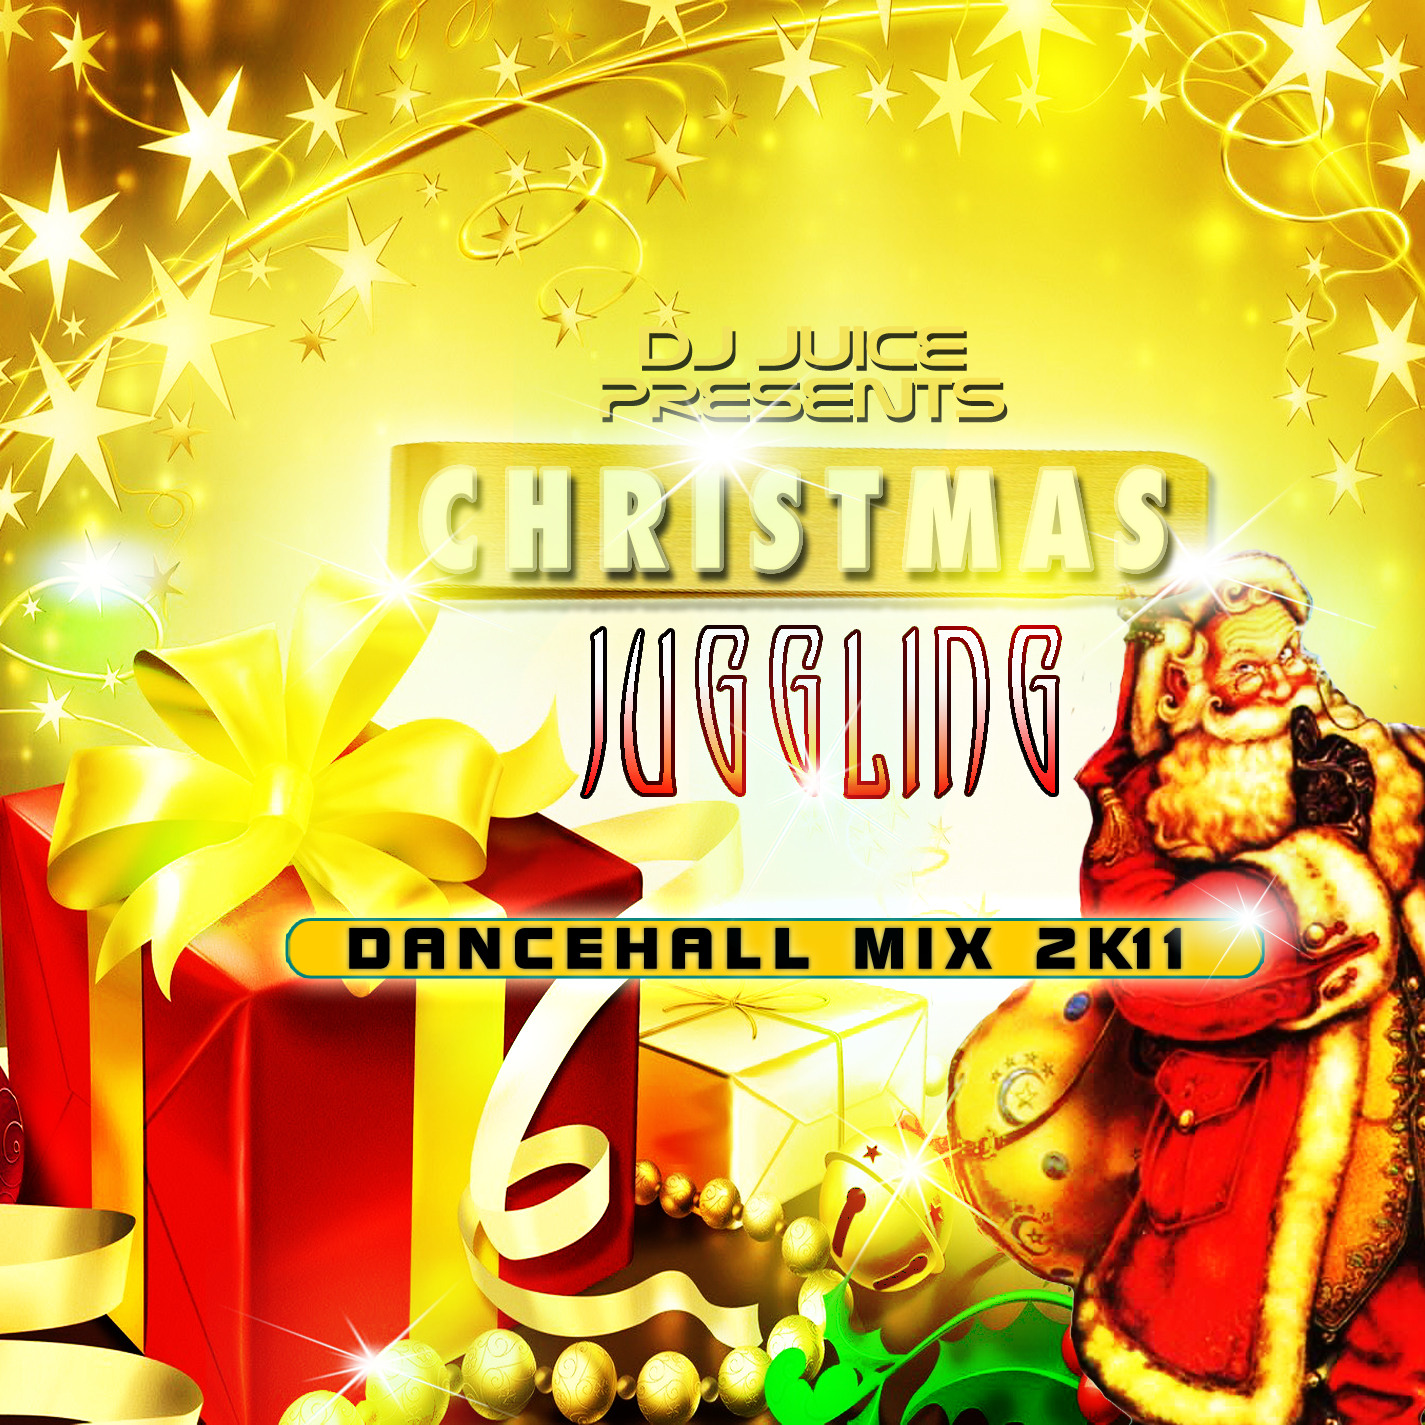 http://4.bp.blogspot.com/-LY89YxMbTkQ/TvWjGgK2xJI/AAAAAAAAP-I/UKktEQT-WPs/s1600/DJ+JUICE+CHRISTMAS+MIX.jpg